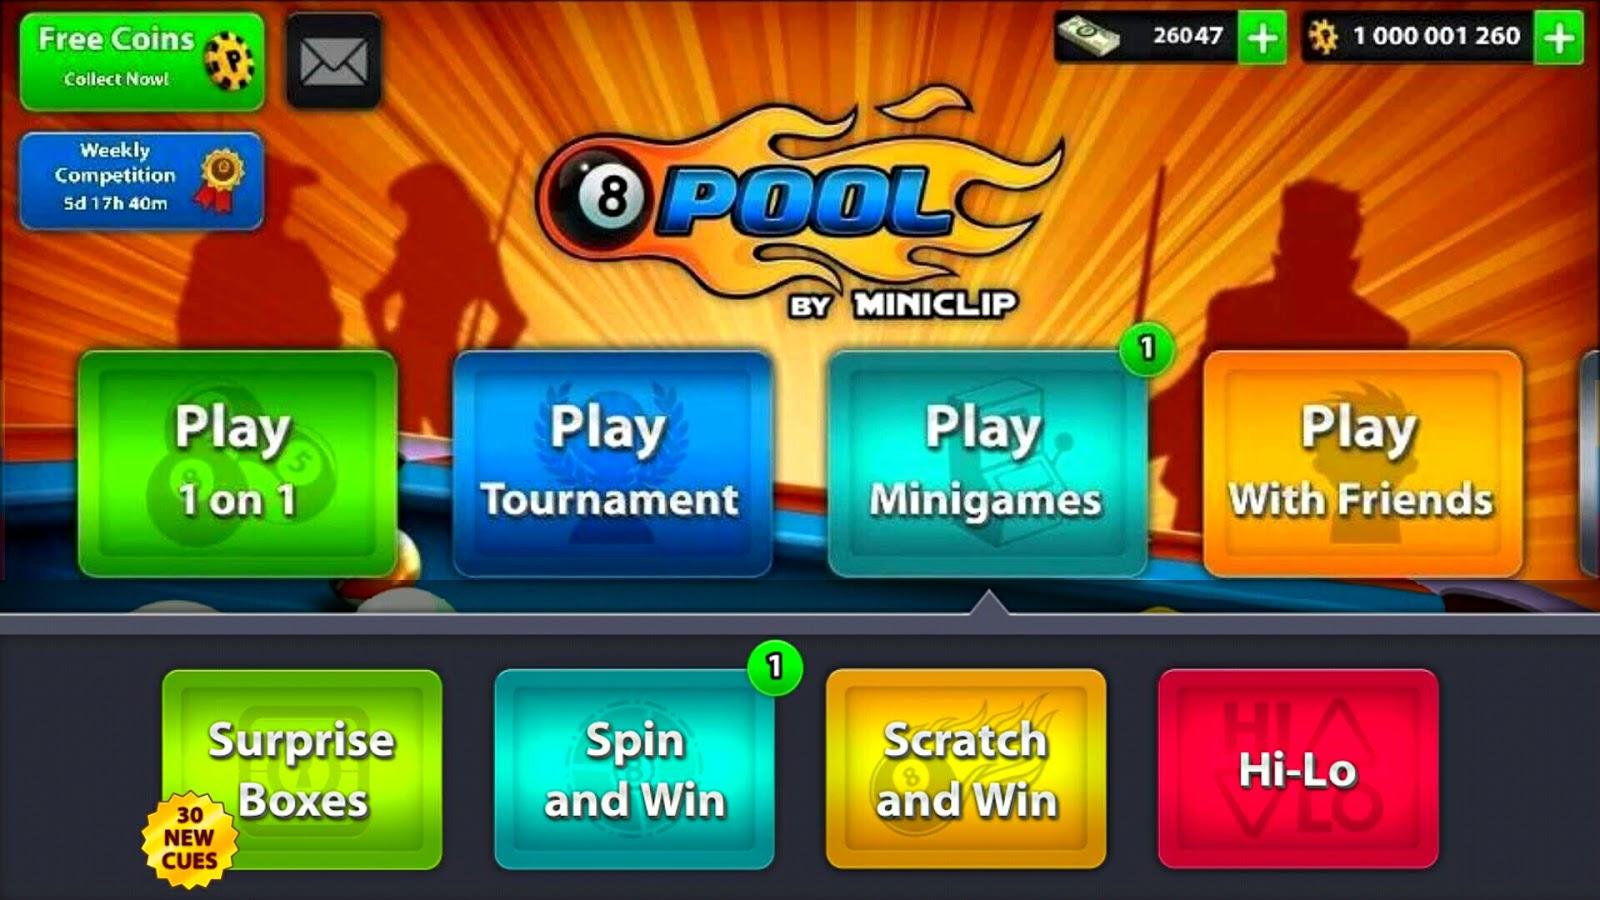 8 ball pool 3.12 Hack mod Apk unlimited + 100% anti-ban - Dr Rann - Andropalac.org